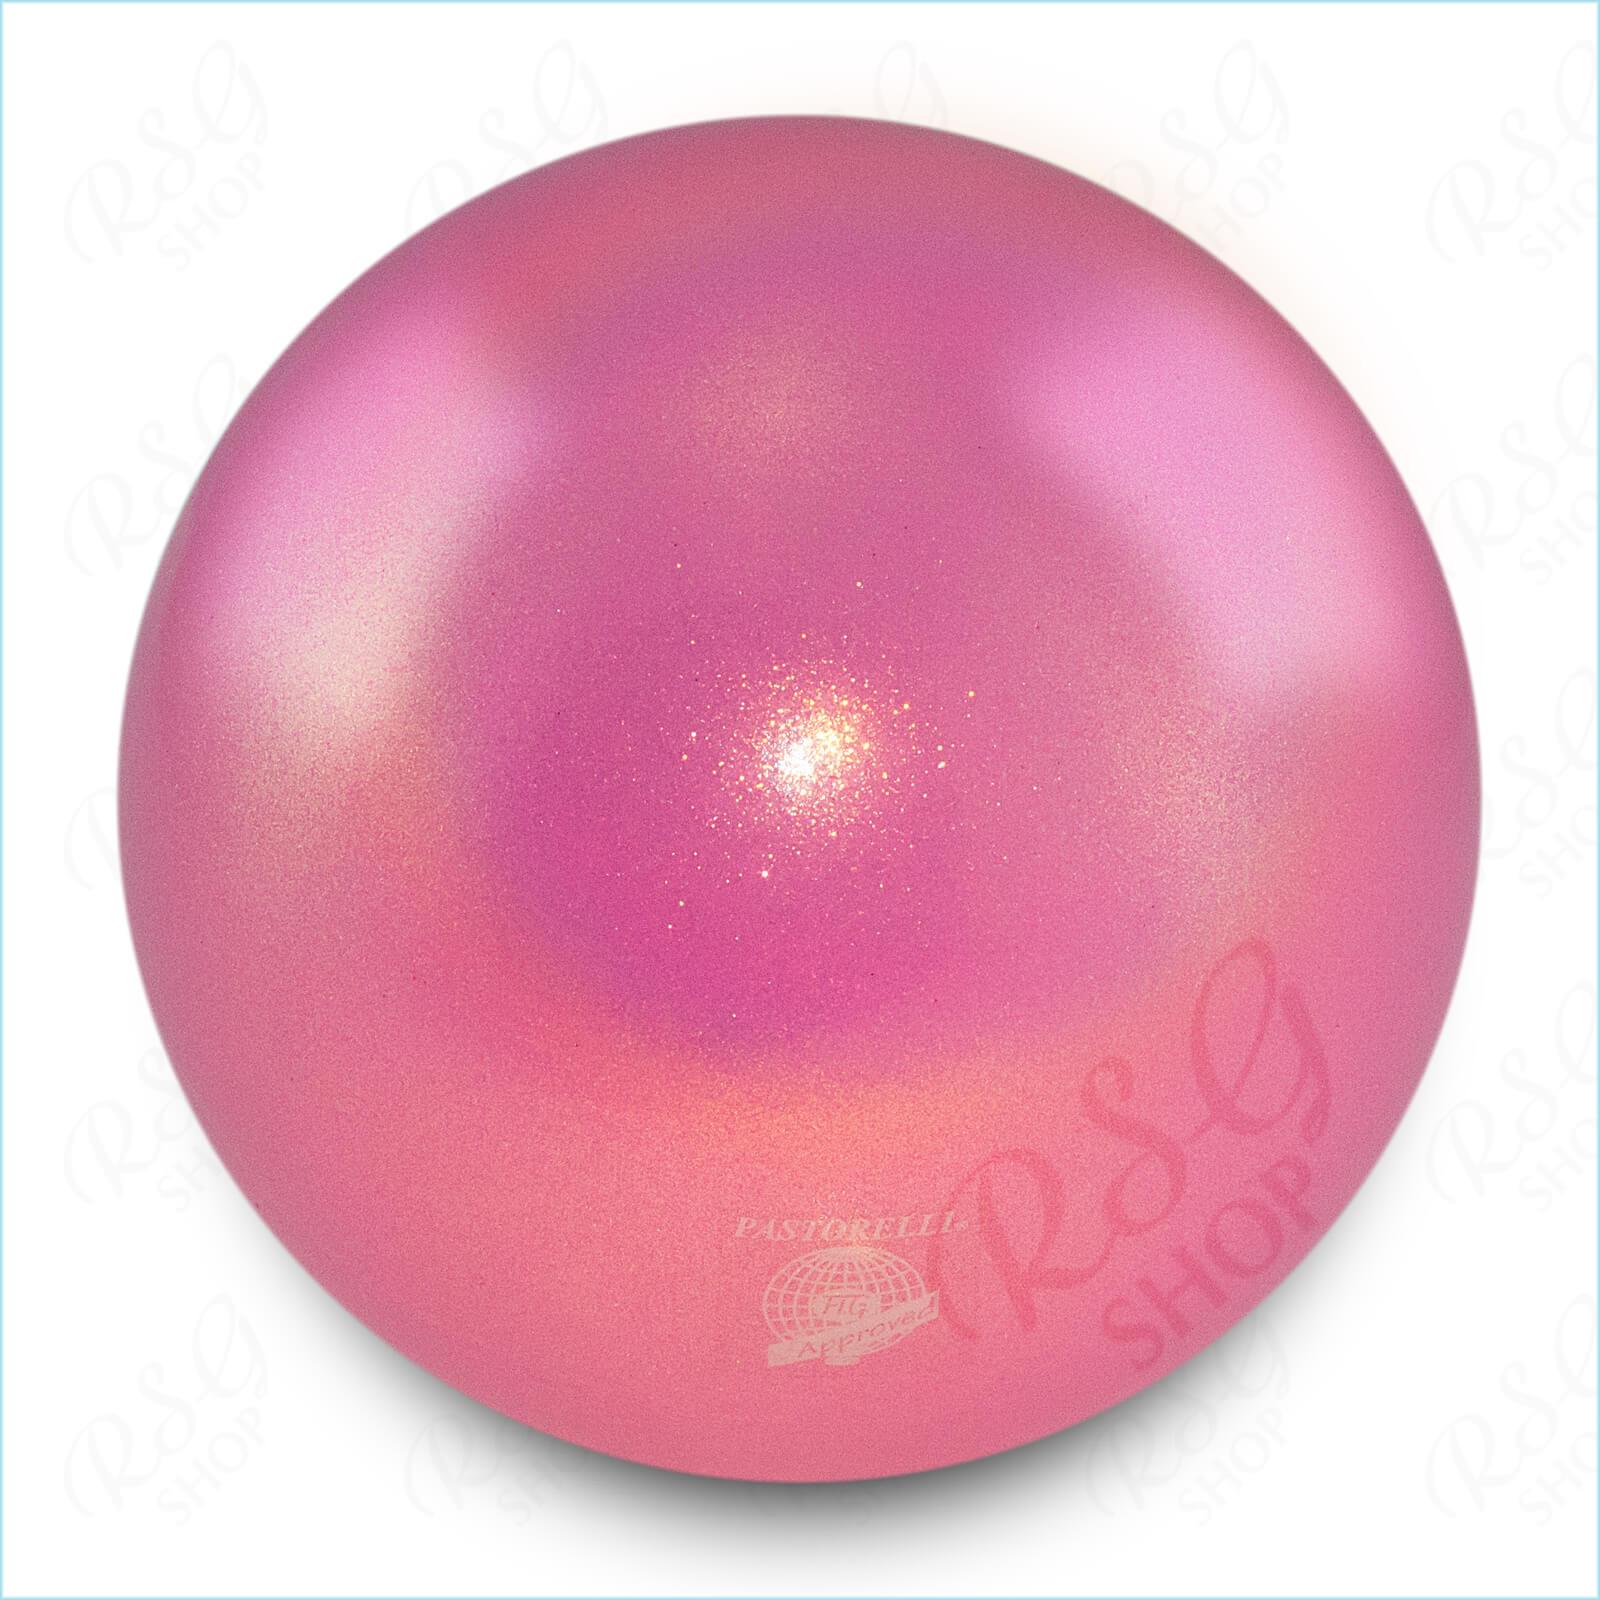 Мяч 18 см Pastorelli HV цвет Светло-Розовый Артикул 00039